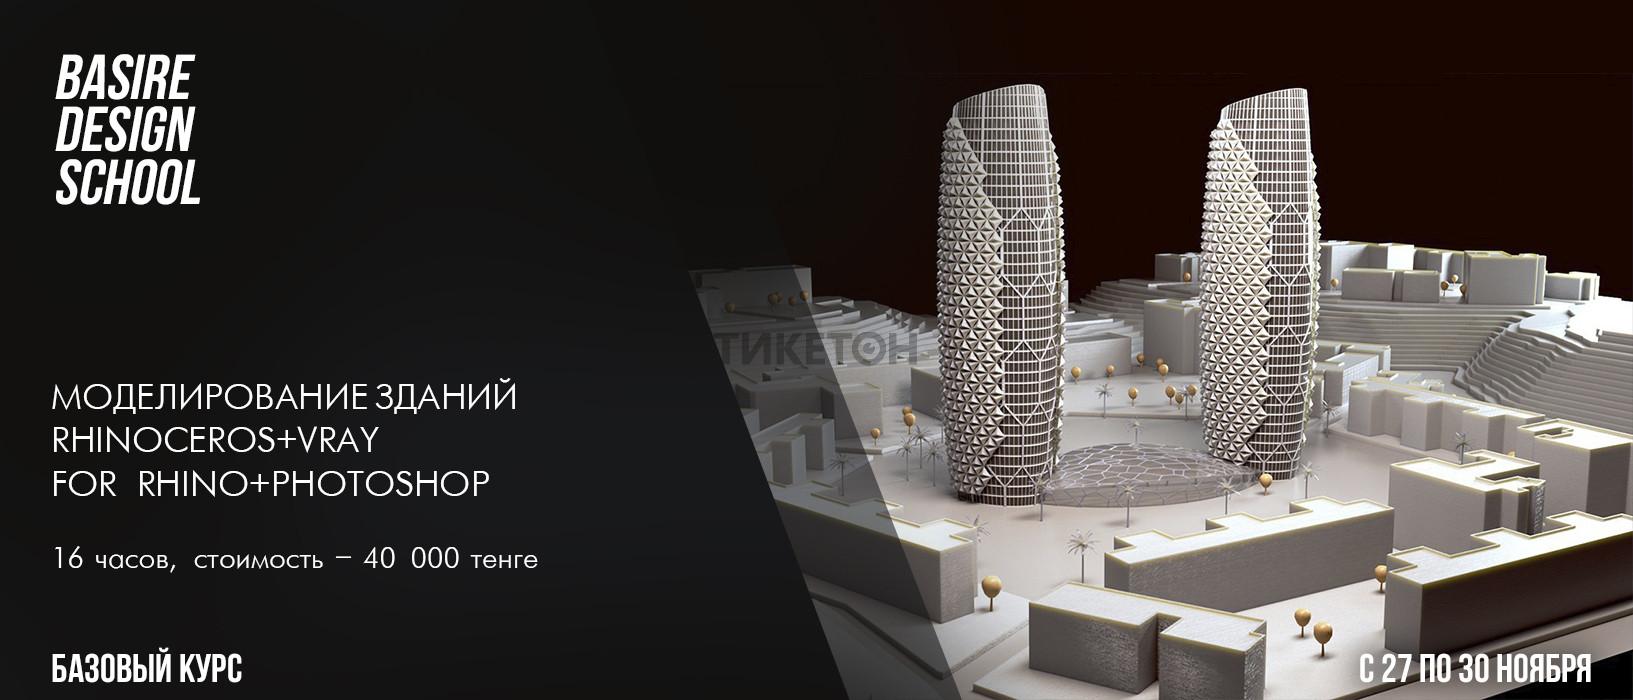 Тренинг «Моделирование зданий Rhinoceros+Vray for Rhino+Photoshop»